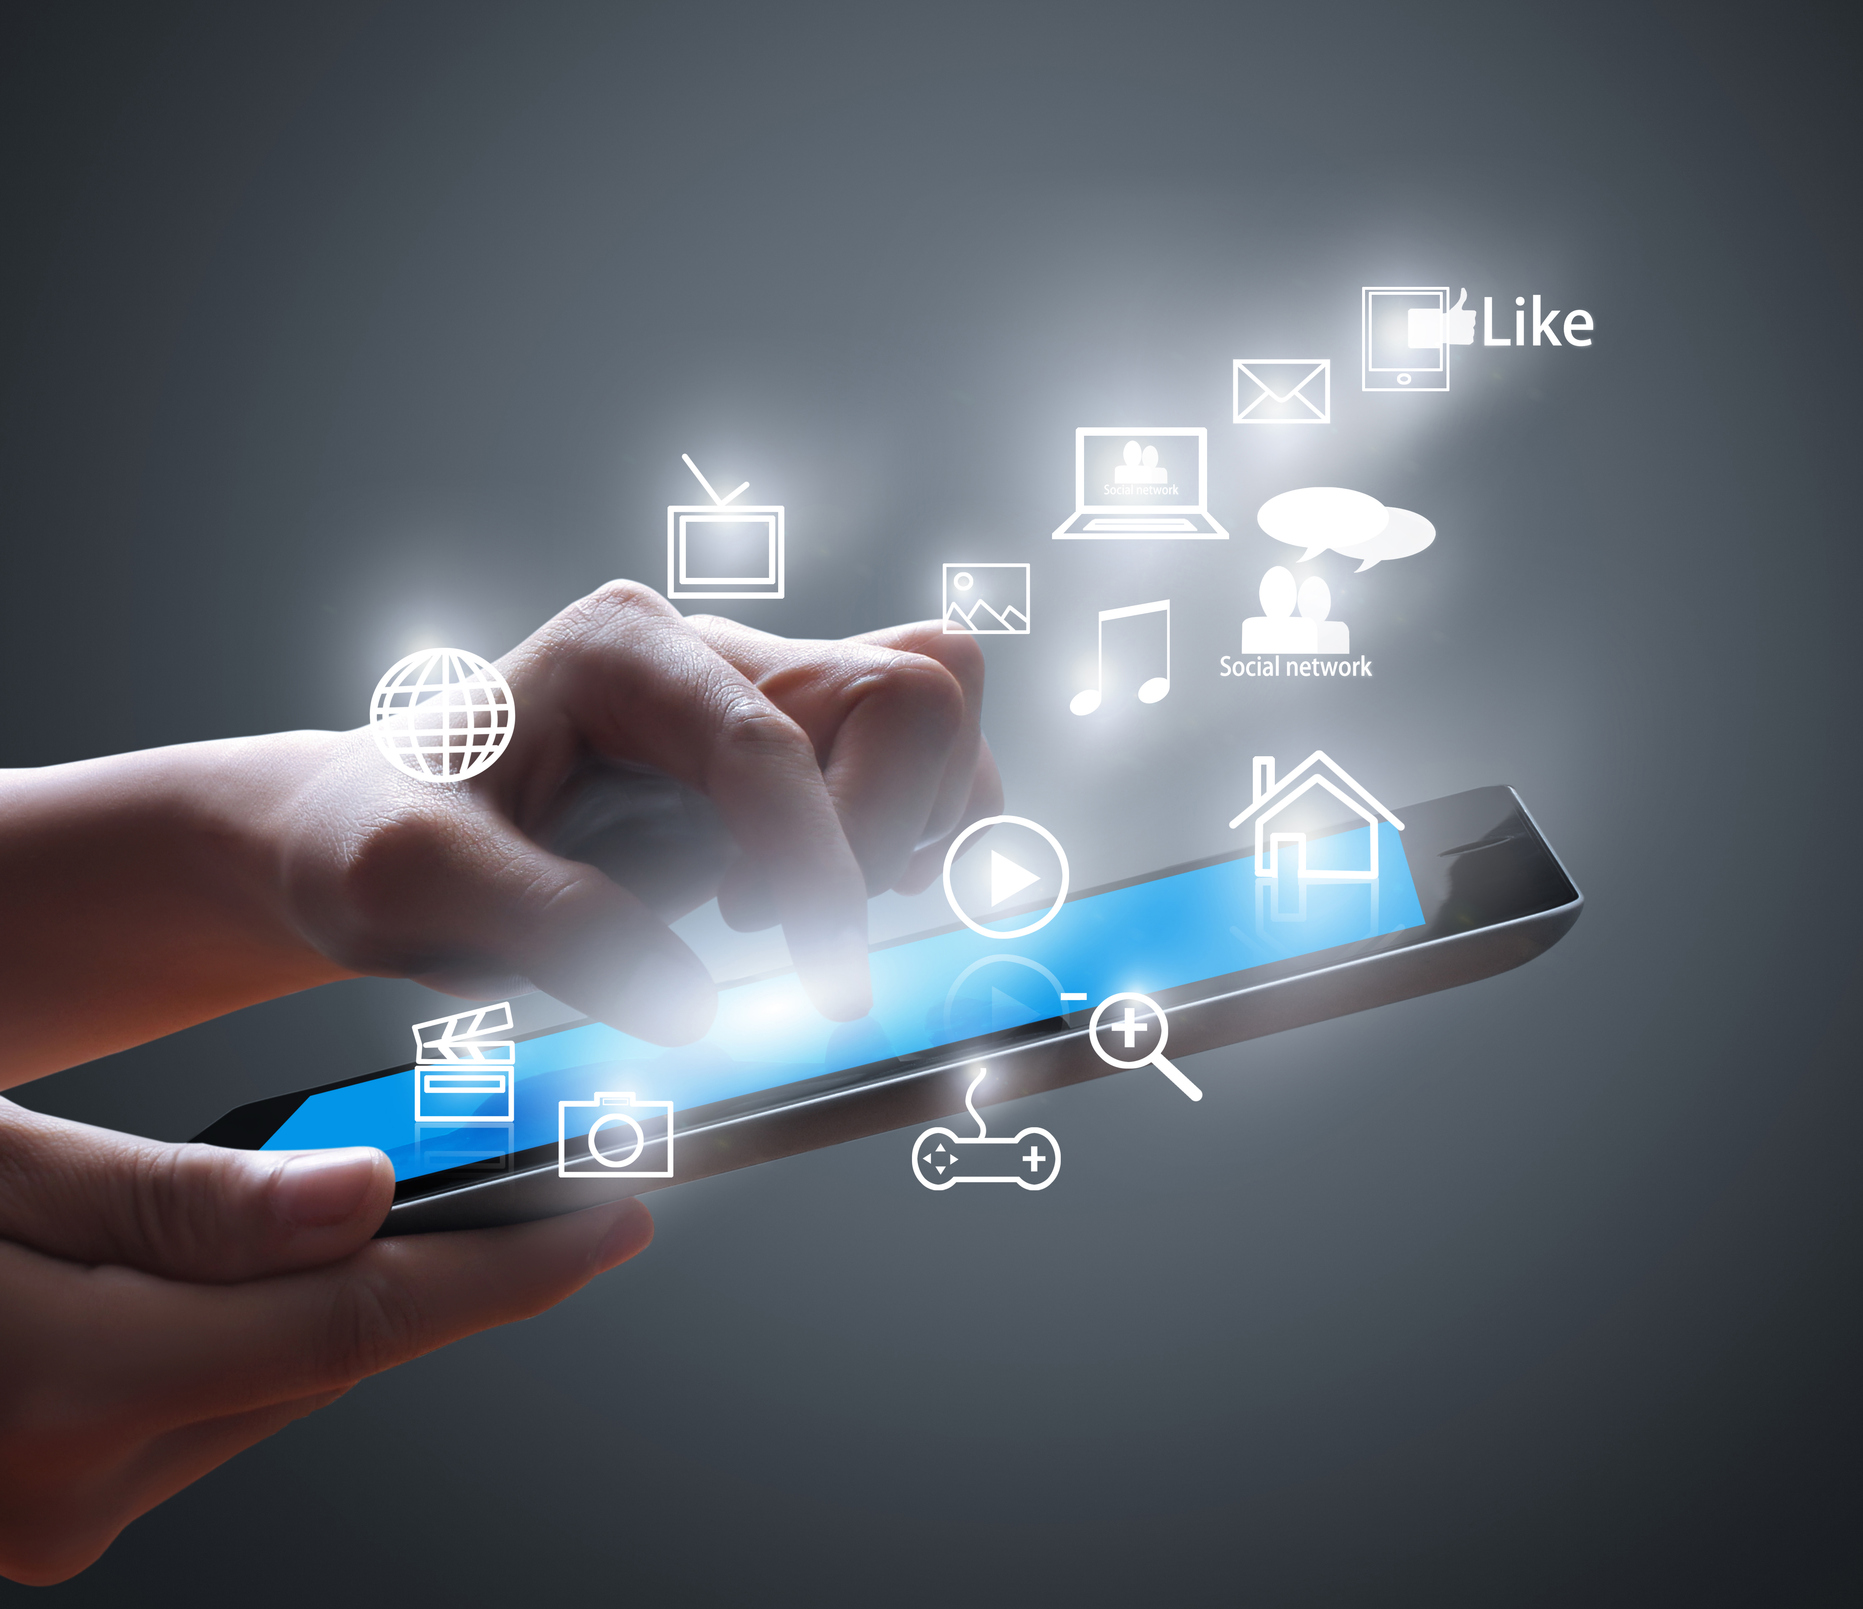 8 Reasons Why You Should Get a Digital Marketing Graduate Certificate